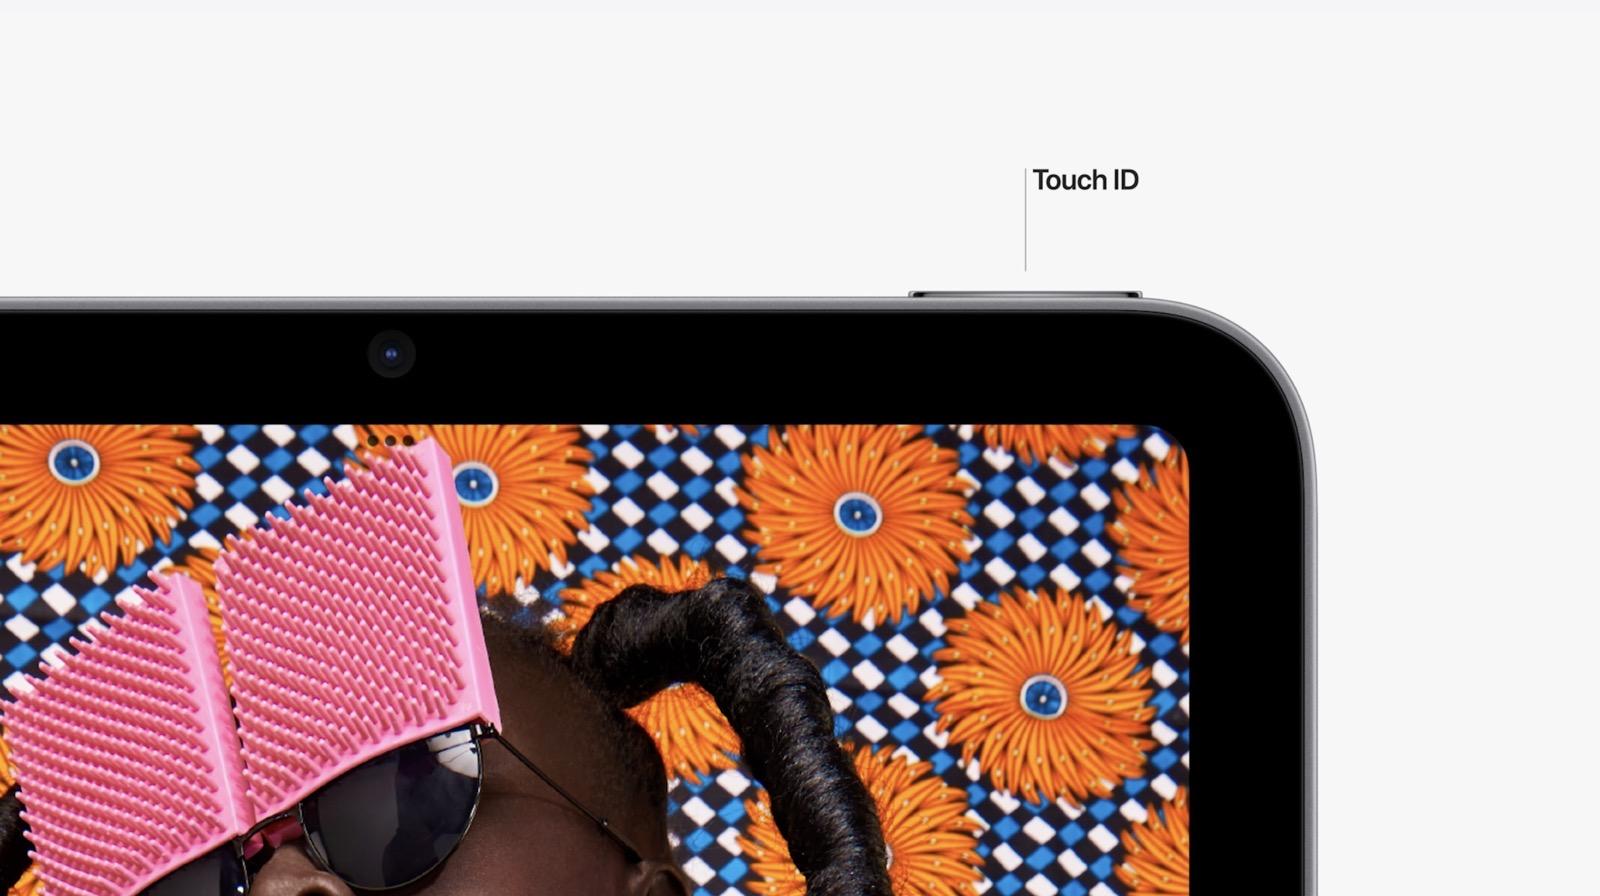 Touch ID on iPad mini 6